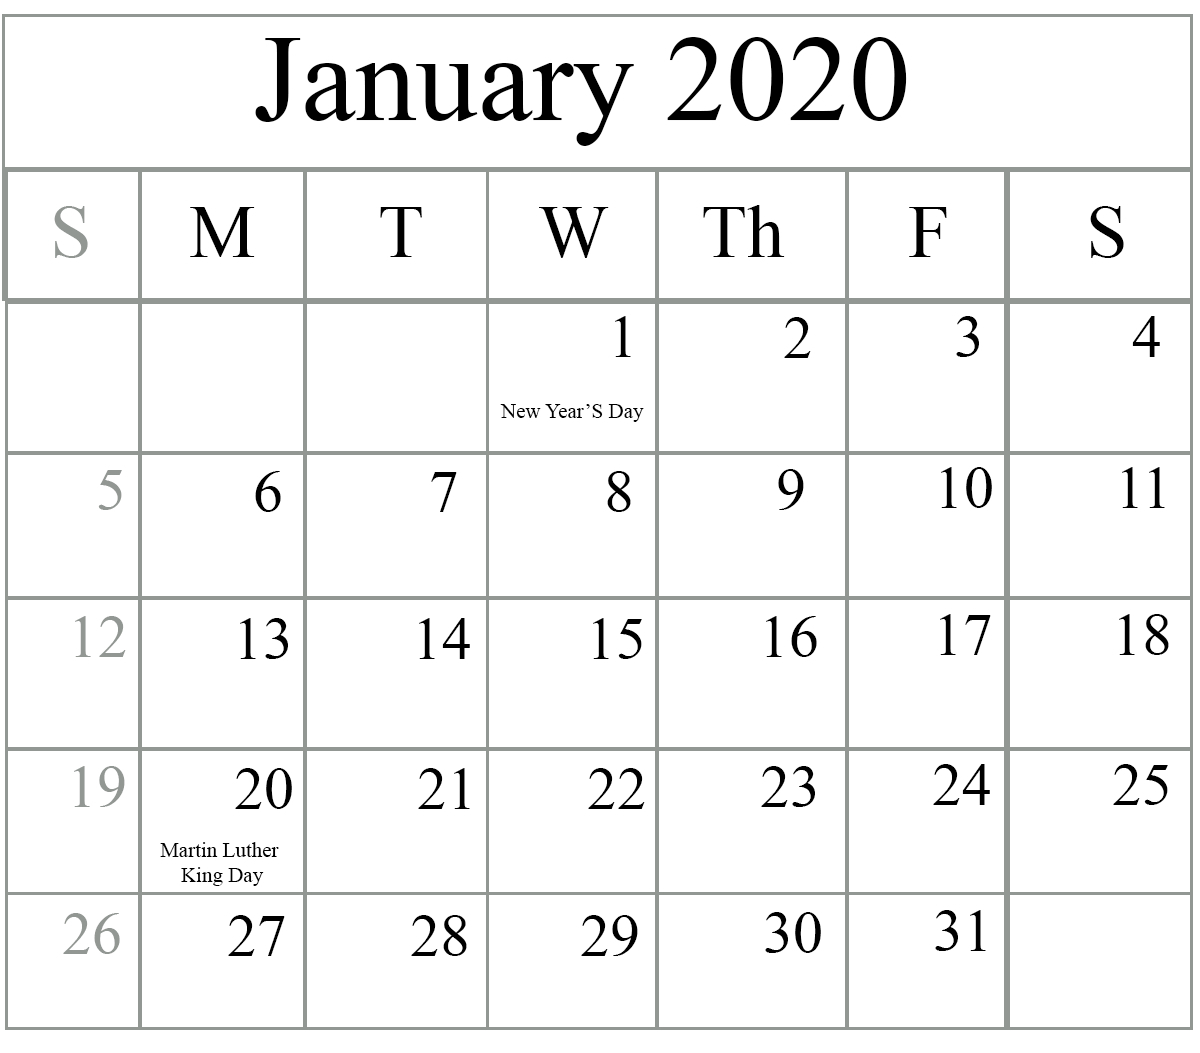 Catch Large Block January 2020 Printable Monthly Calendar